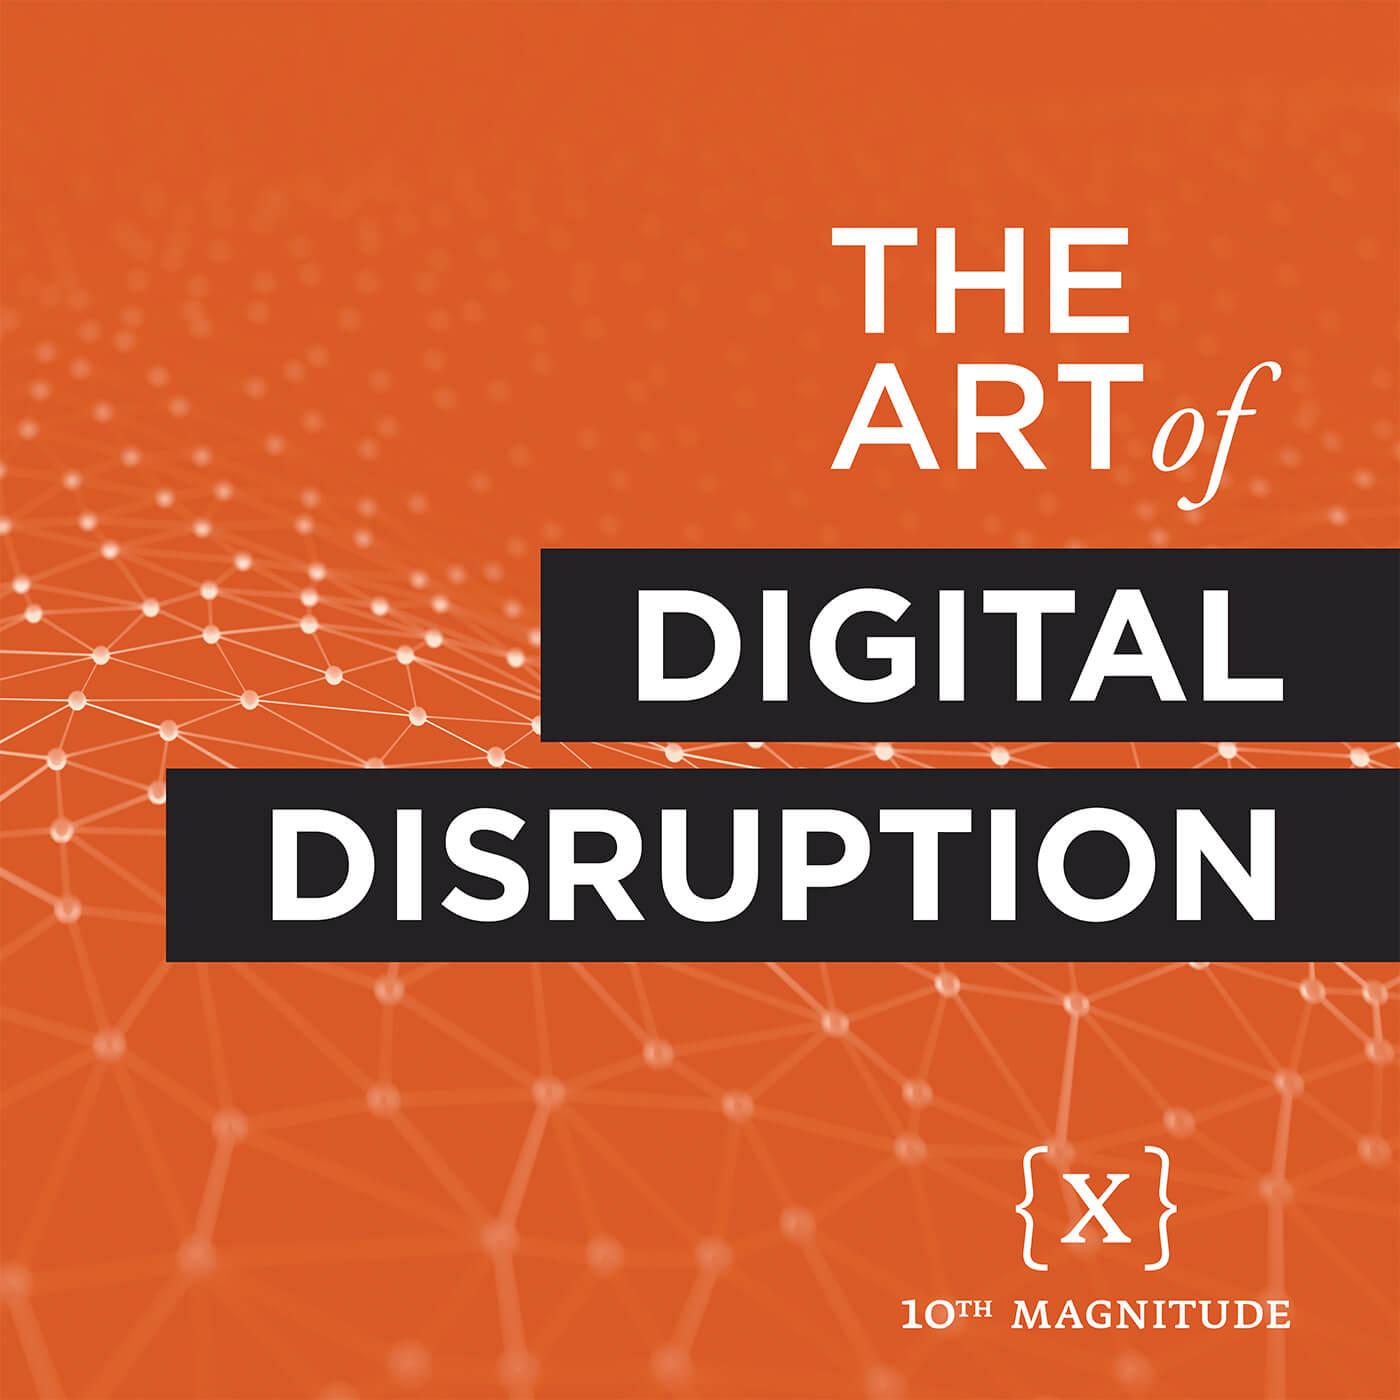 The Art of Digital Disruption